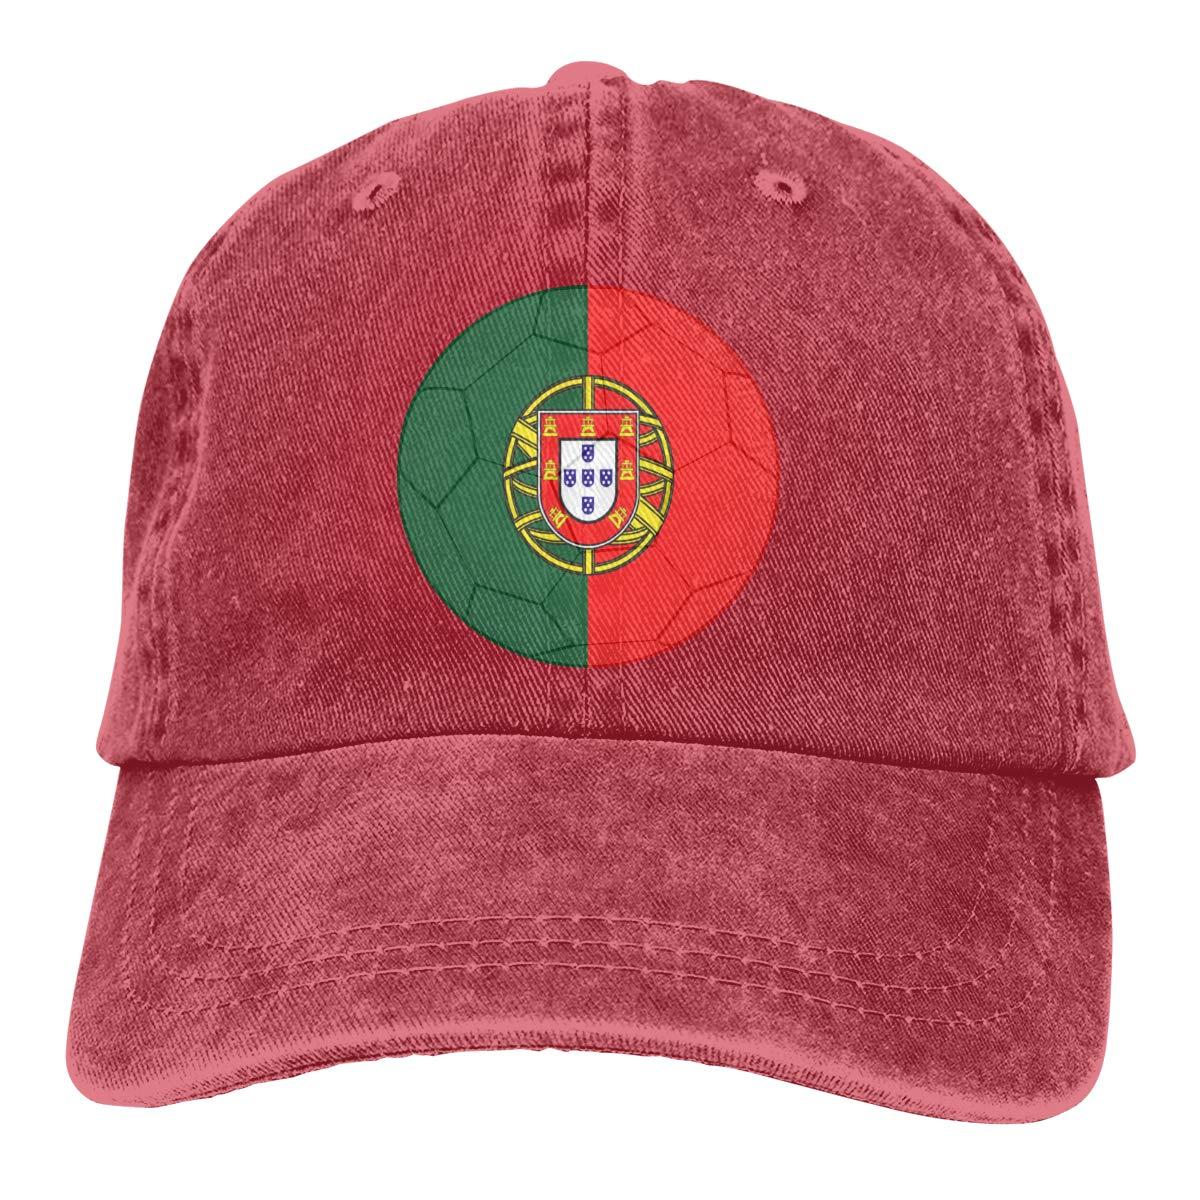 Cotton Hats Amayc Adjustable Mens Denim Baseball Caps 2018 Portuguese Flag and Football Funny